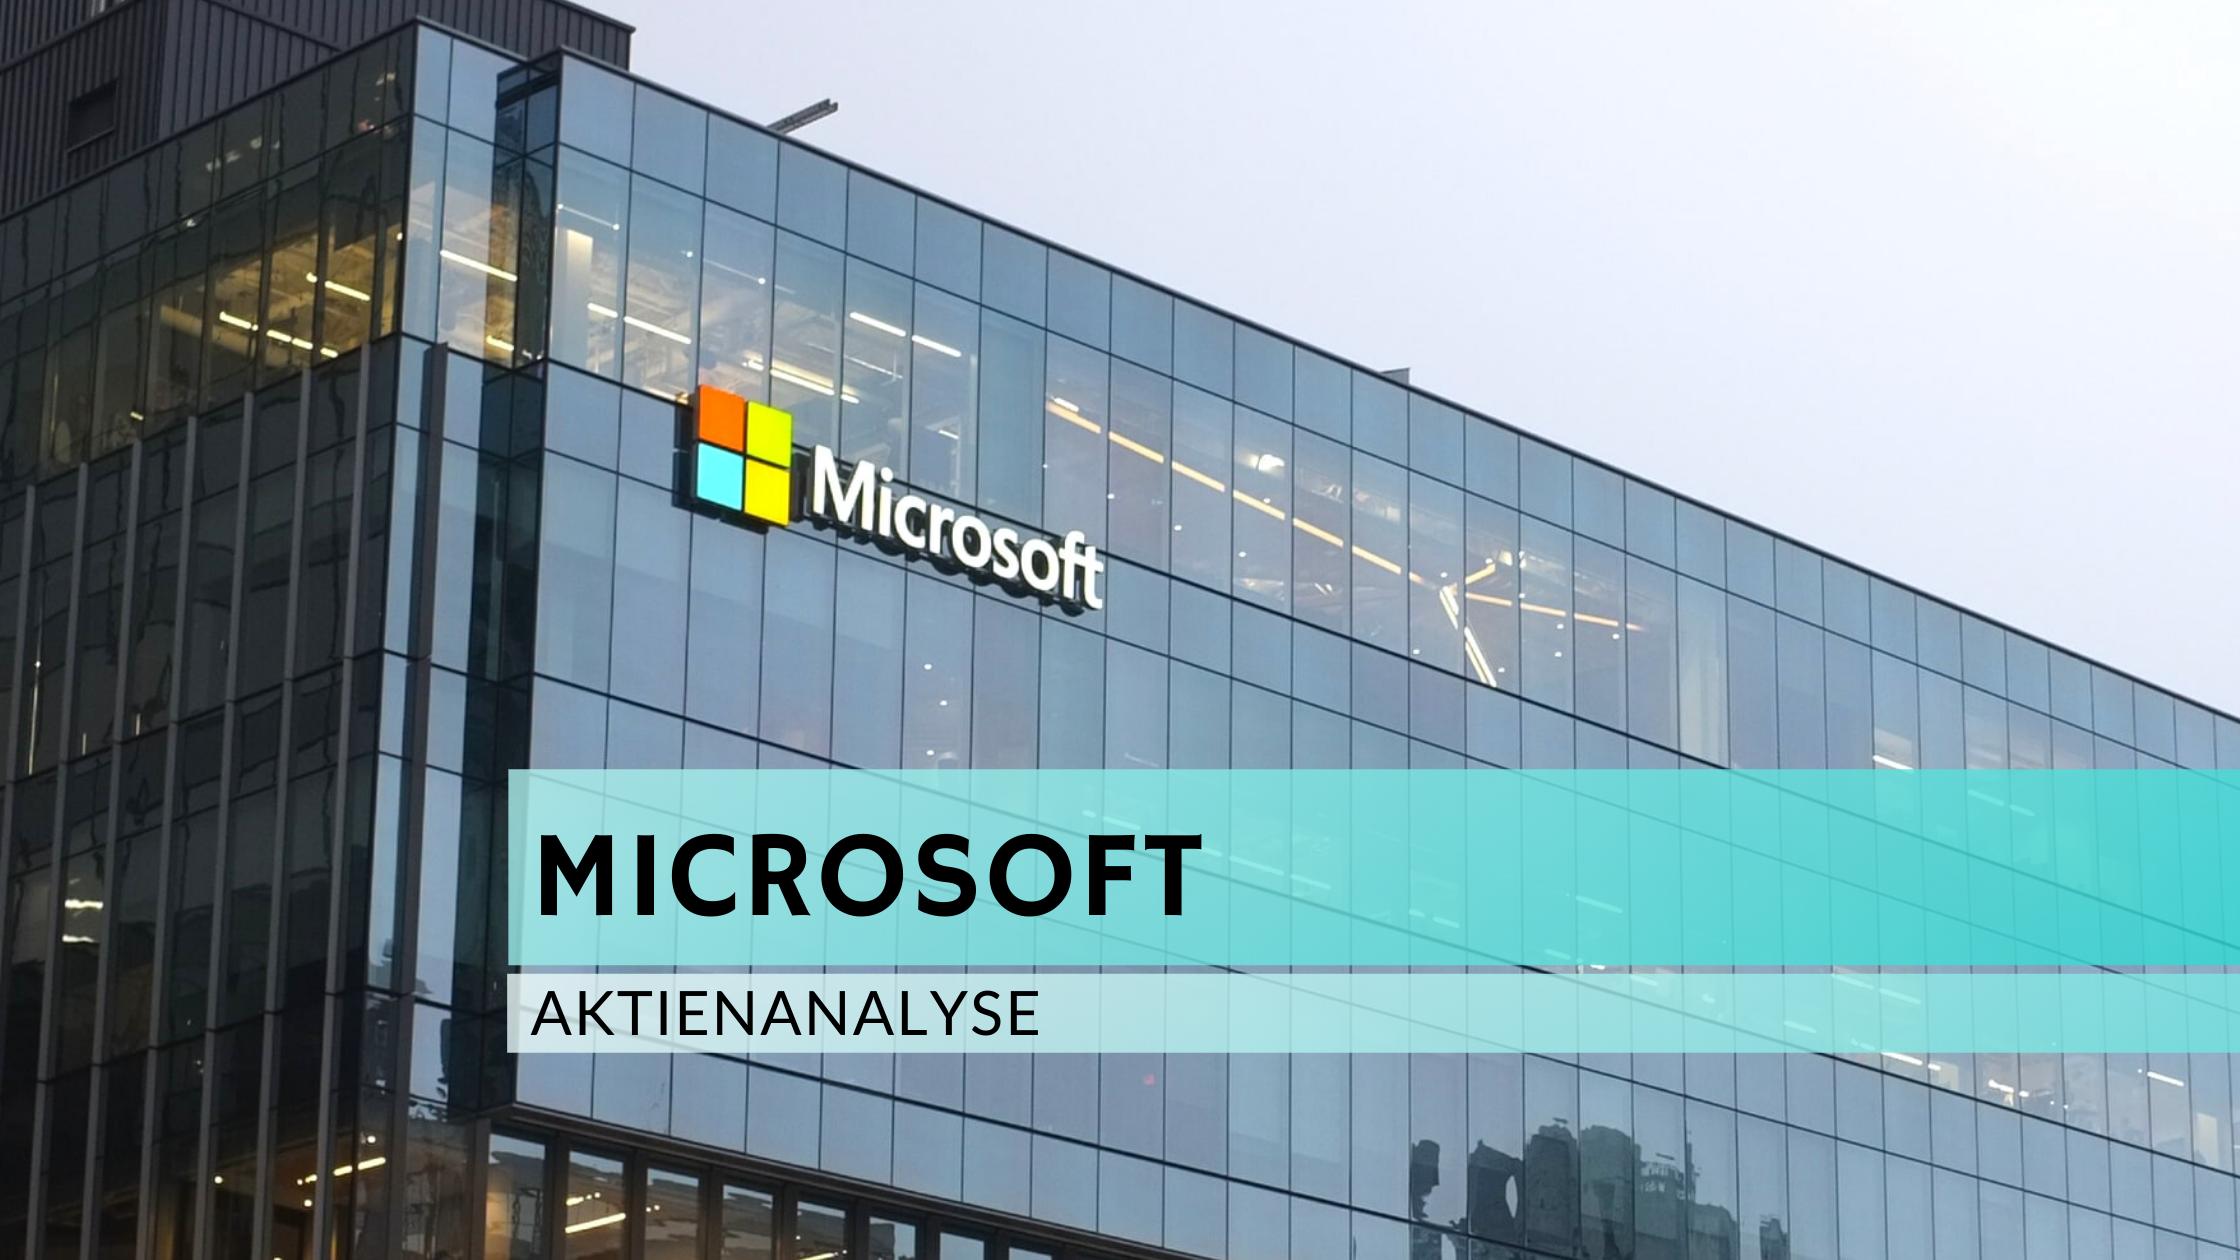 Microsoft Aktienanalyse